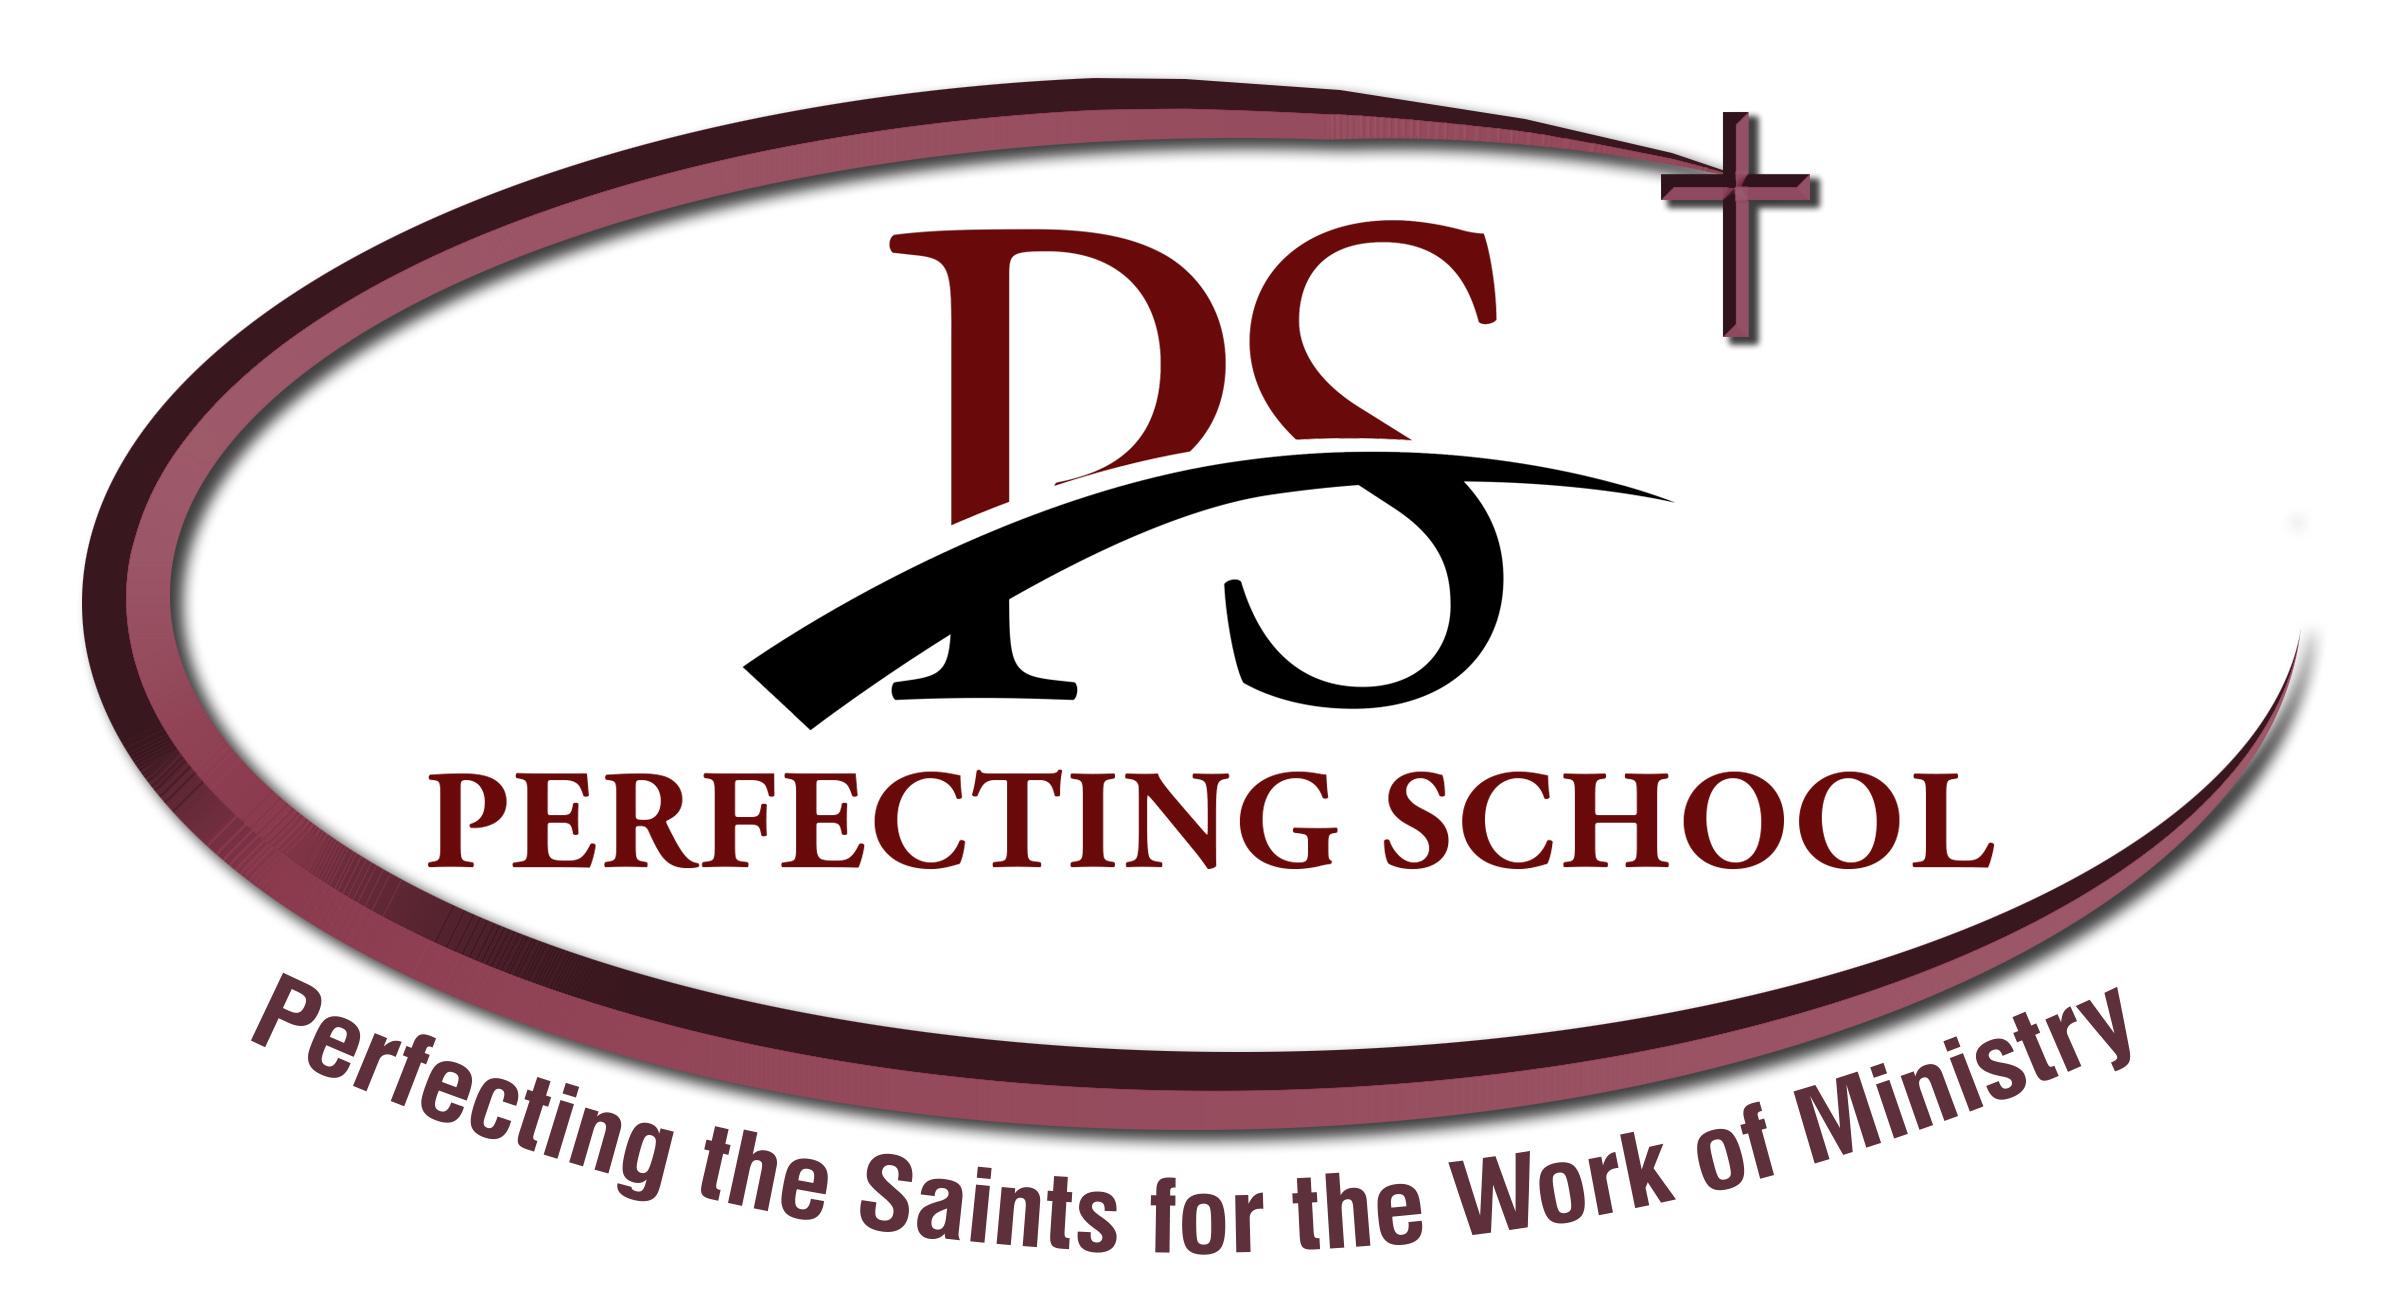 PS Perfecting School3-1